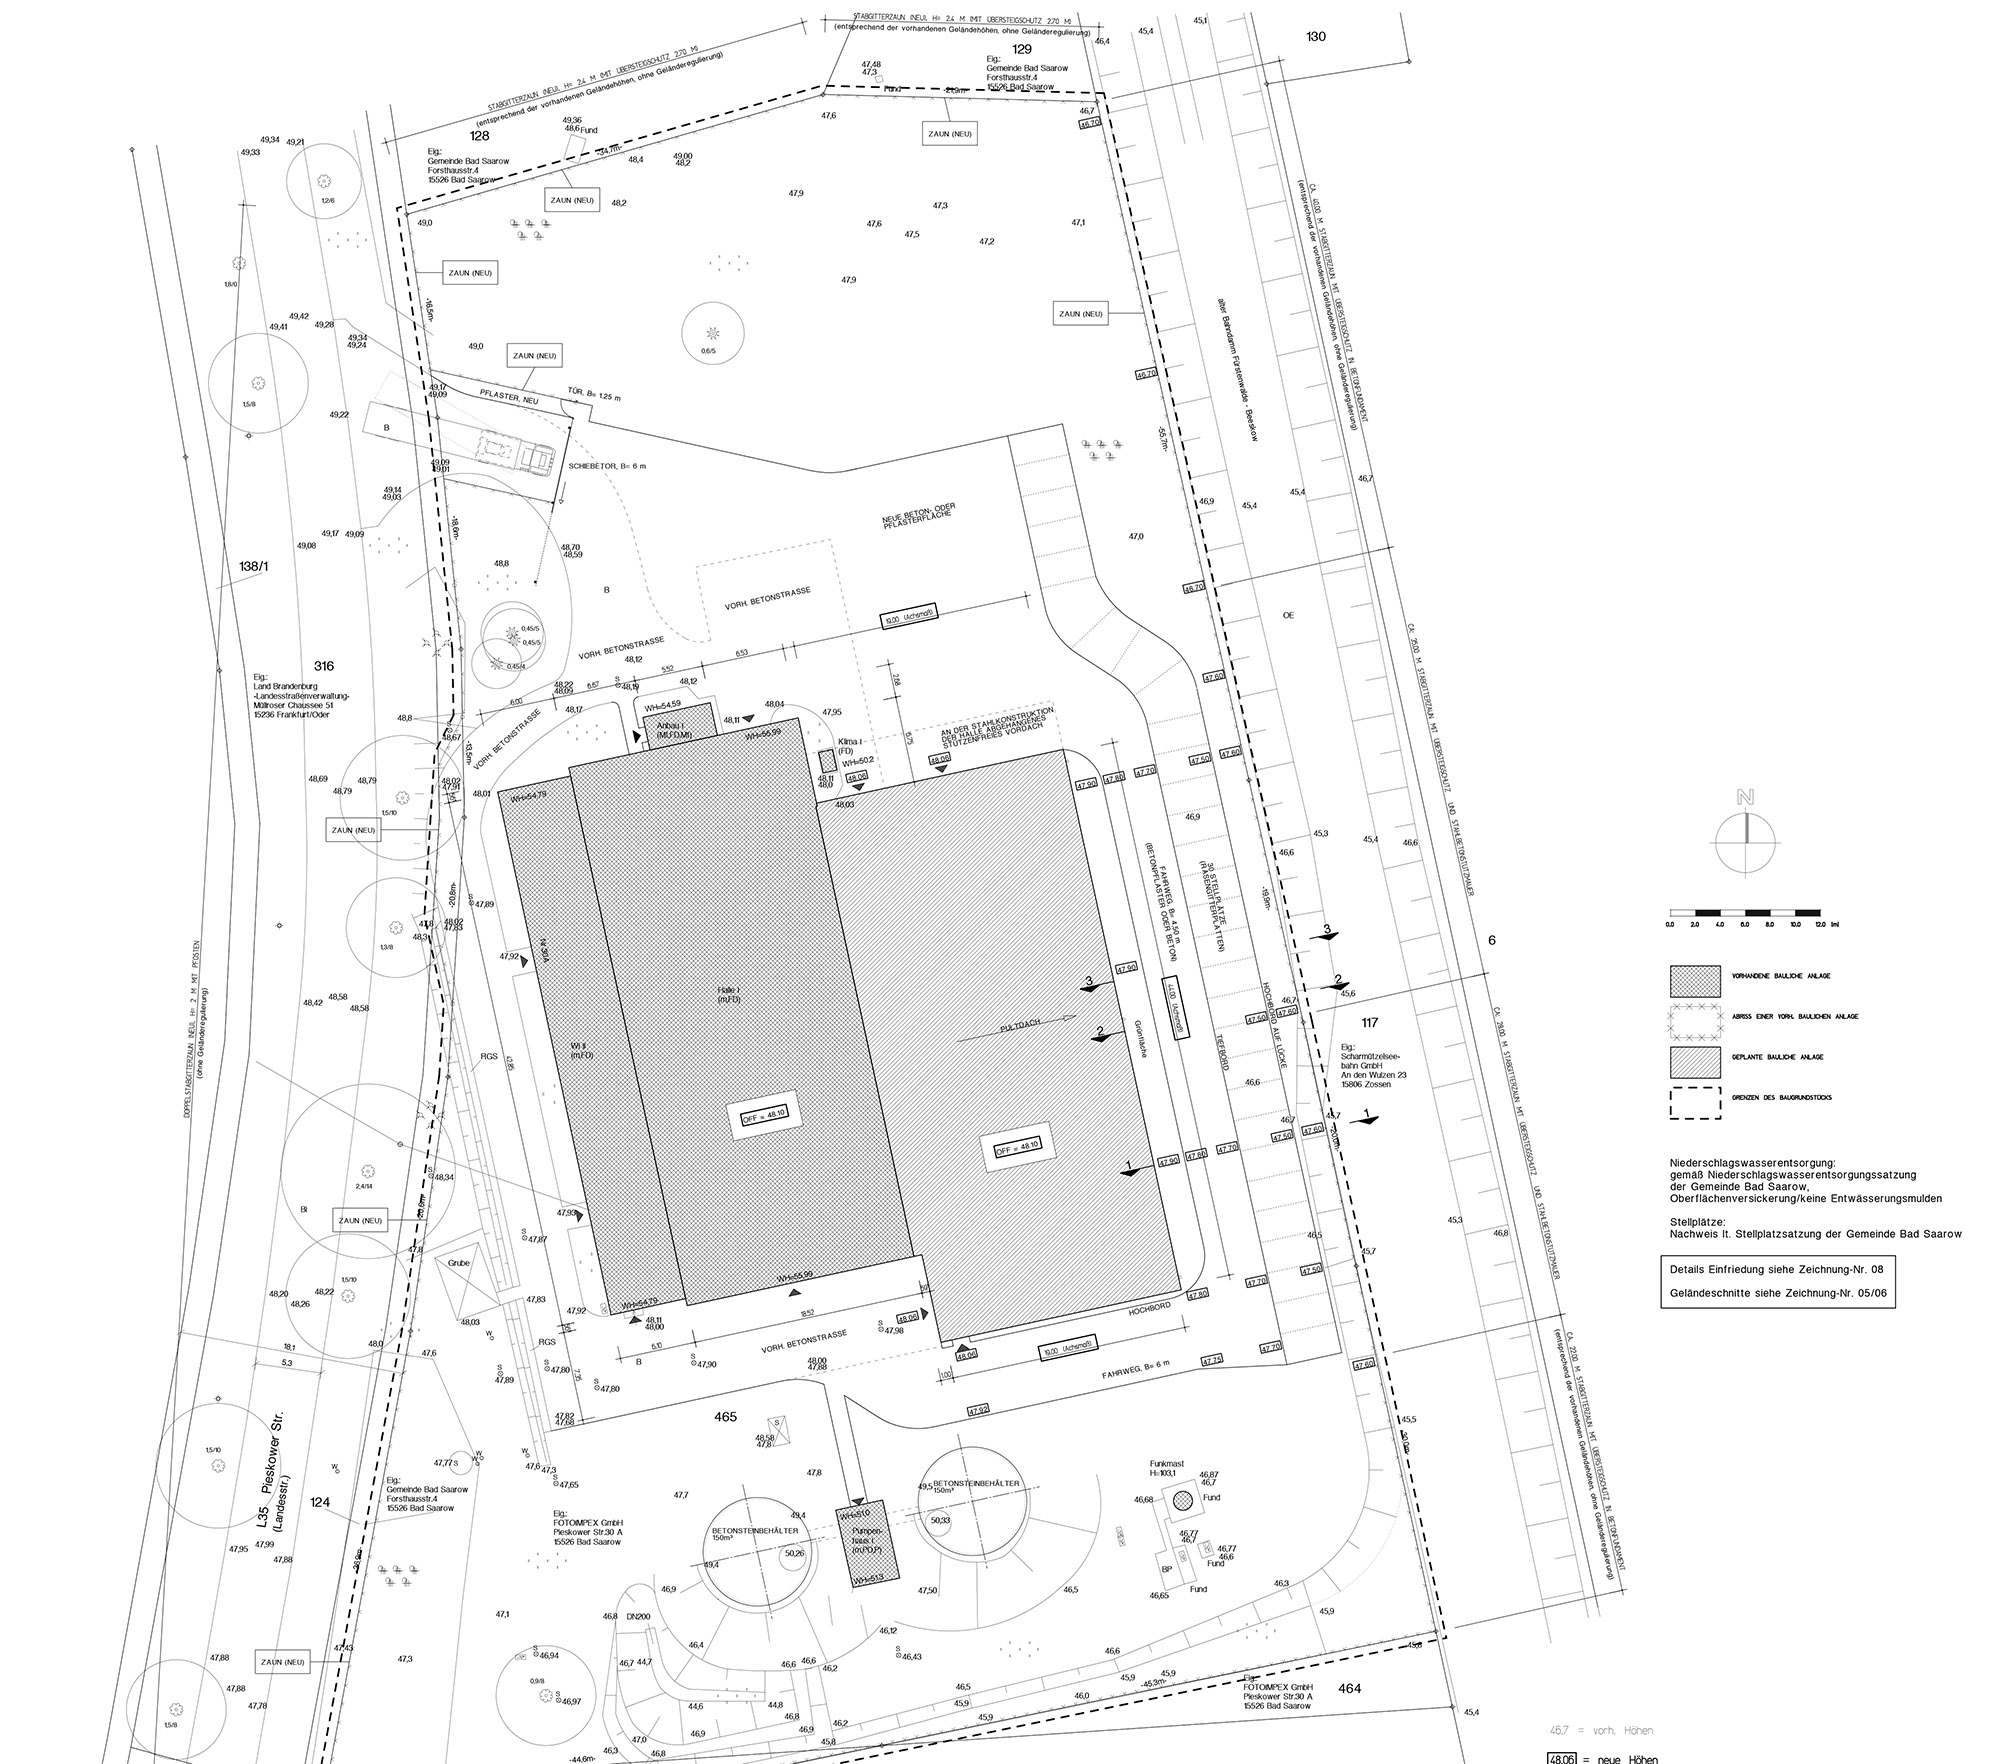 G:PROJEKTEarcplusA8Projekte201515-027 ADOX Fotowerke GmbH